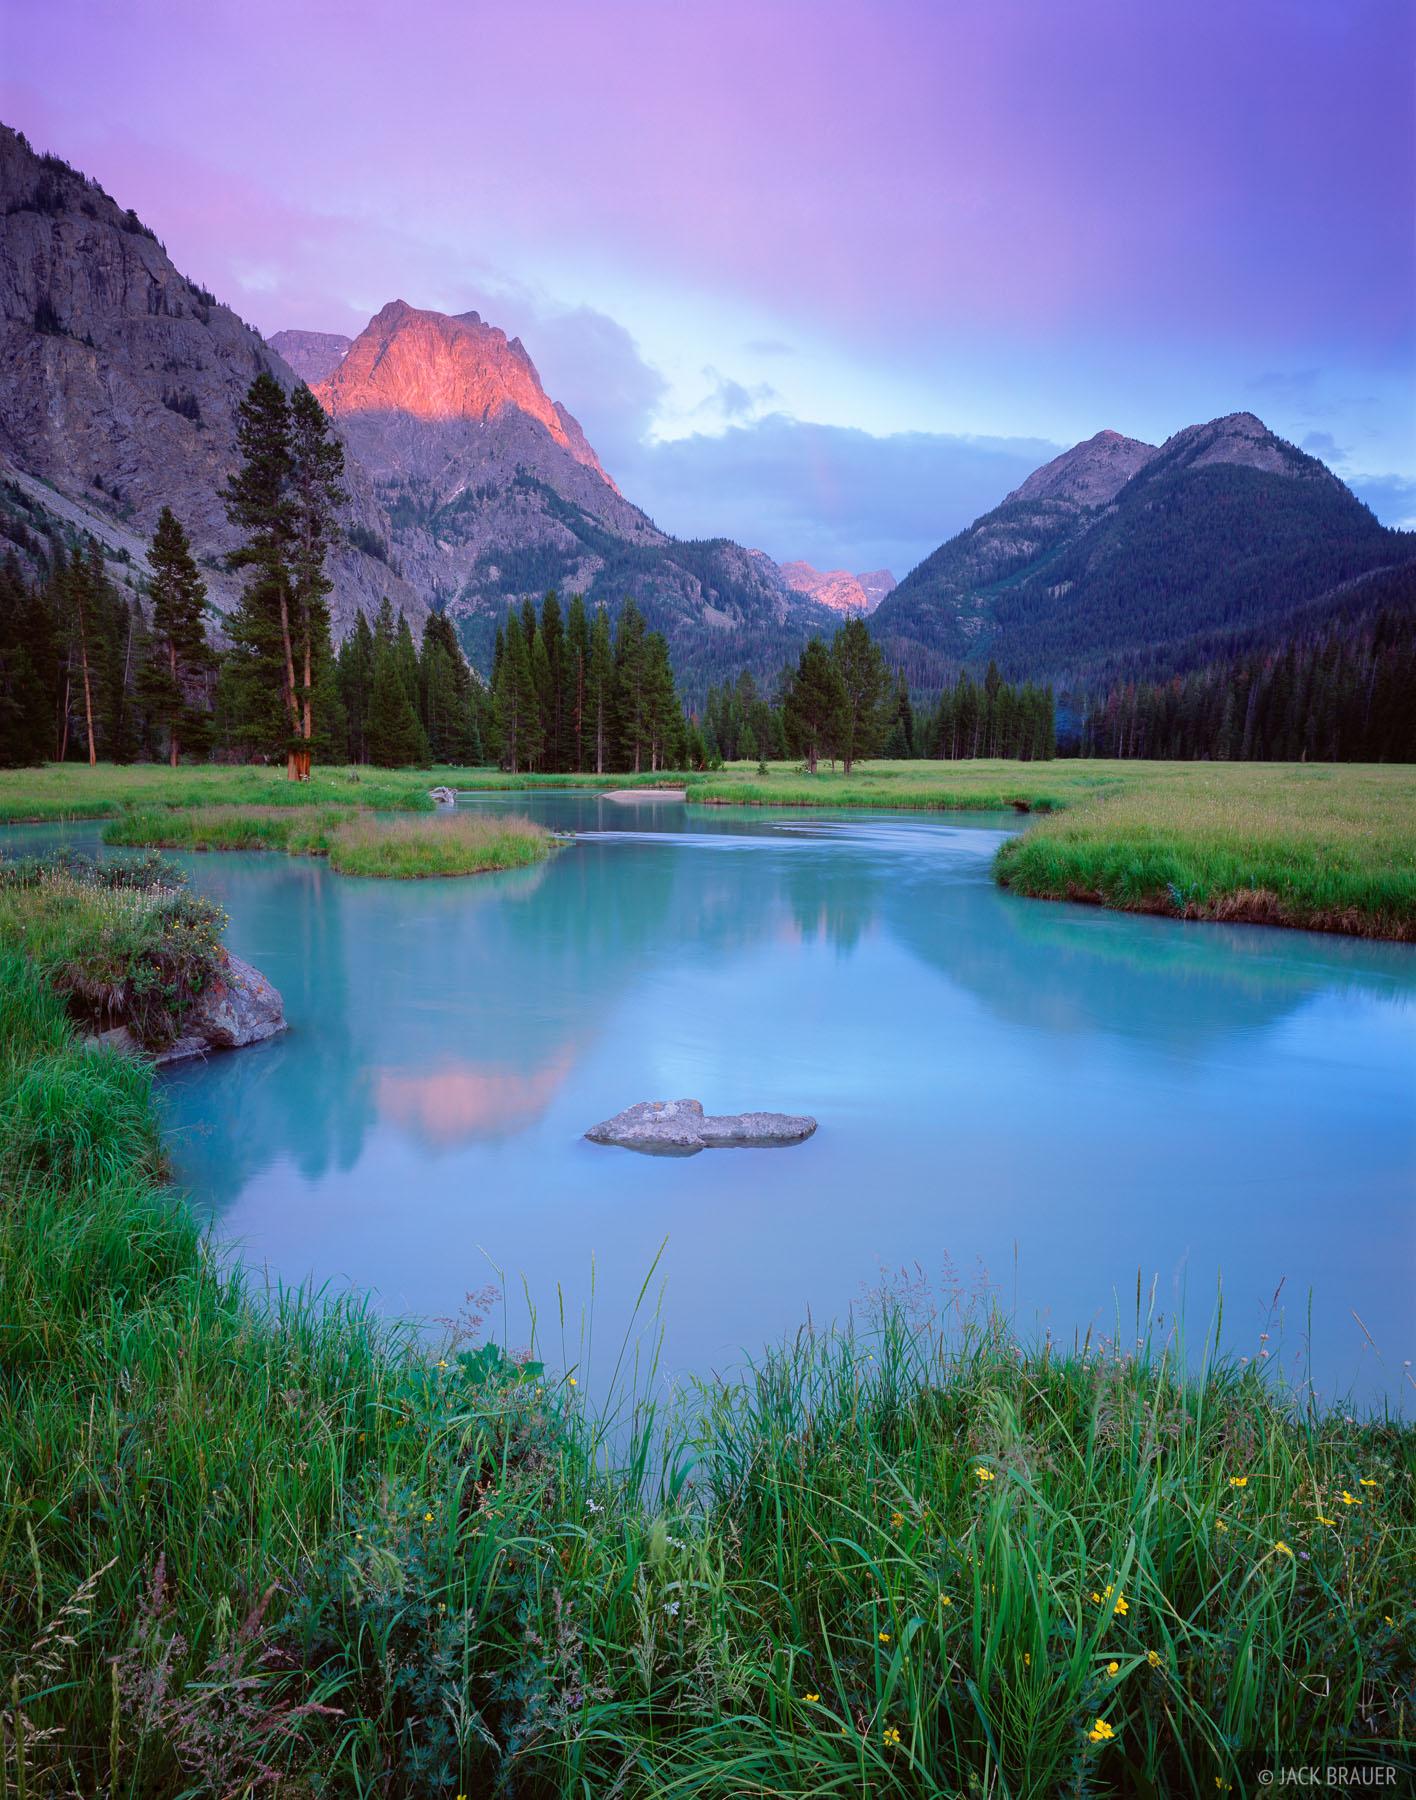 Ladd Peak, Green River, Wind River Range, Wyoming, photo